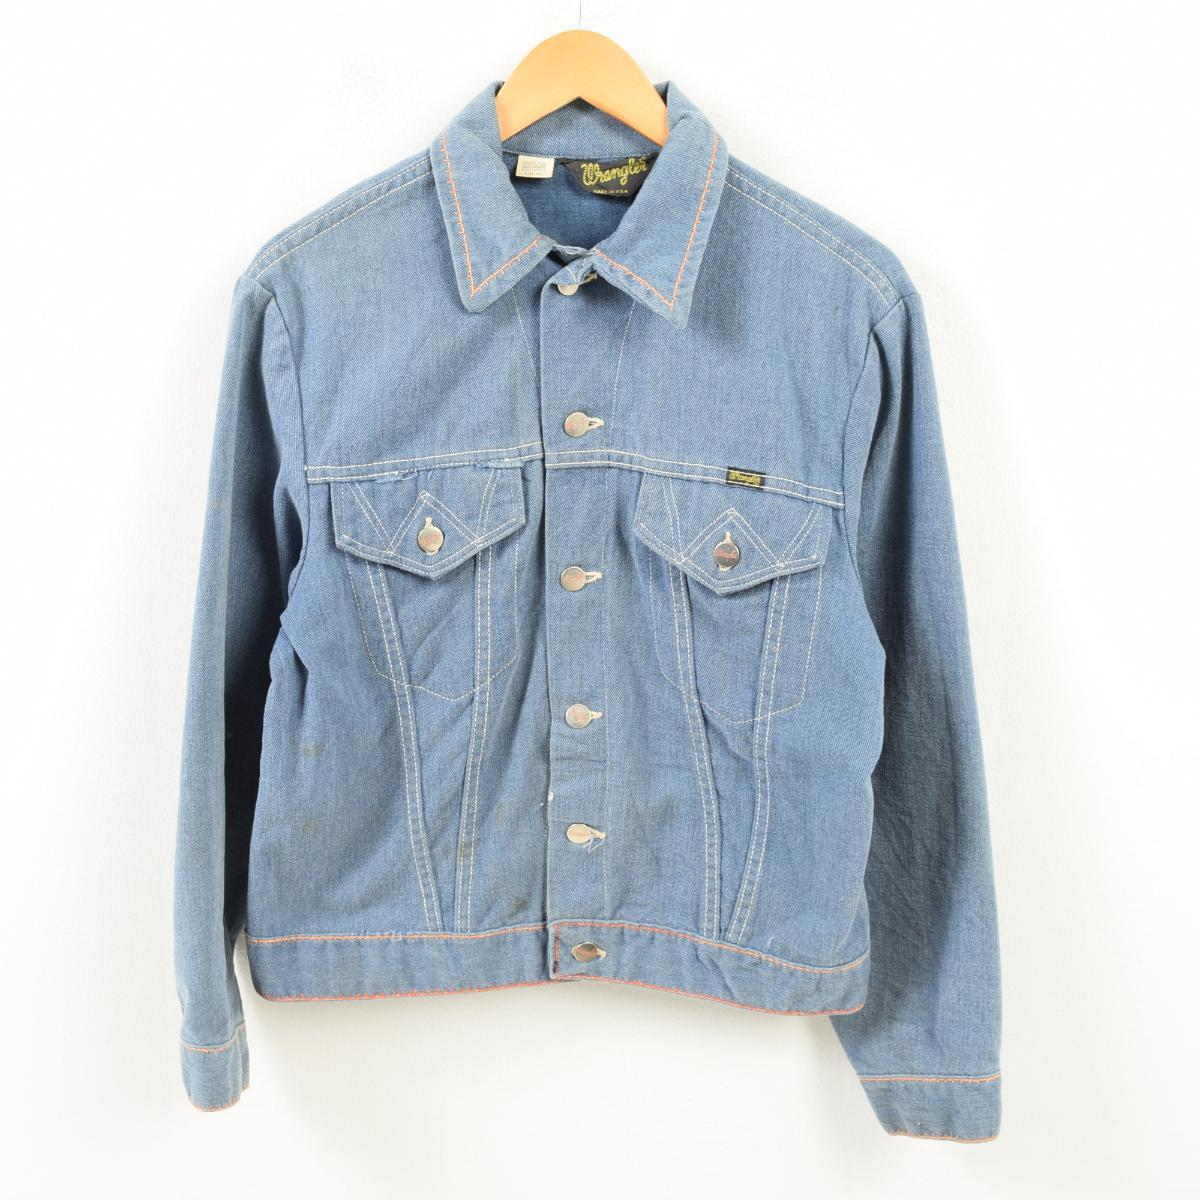 89c5b67d Product made in 70s Wrangler Wrangler denim jacket G Jean USA 40 men's S  vintage ...